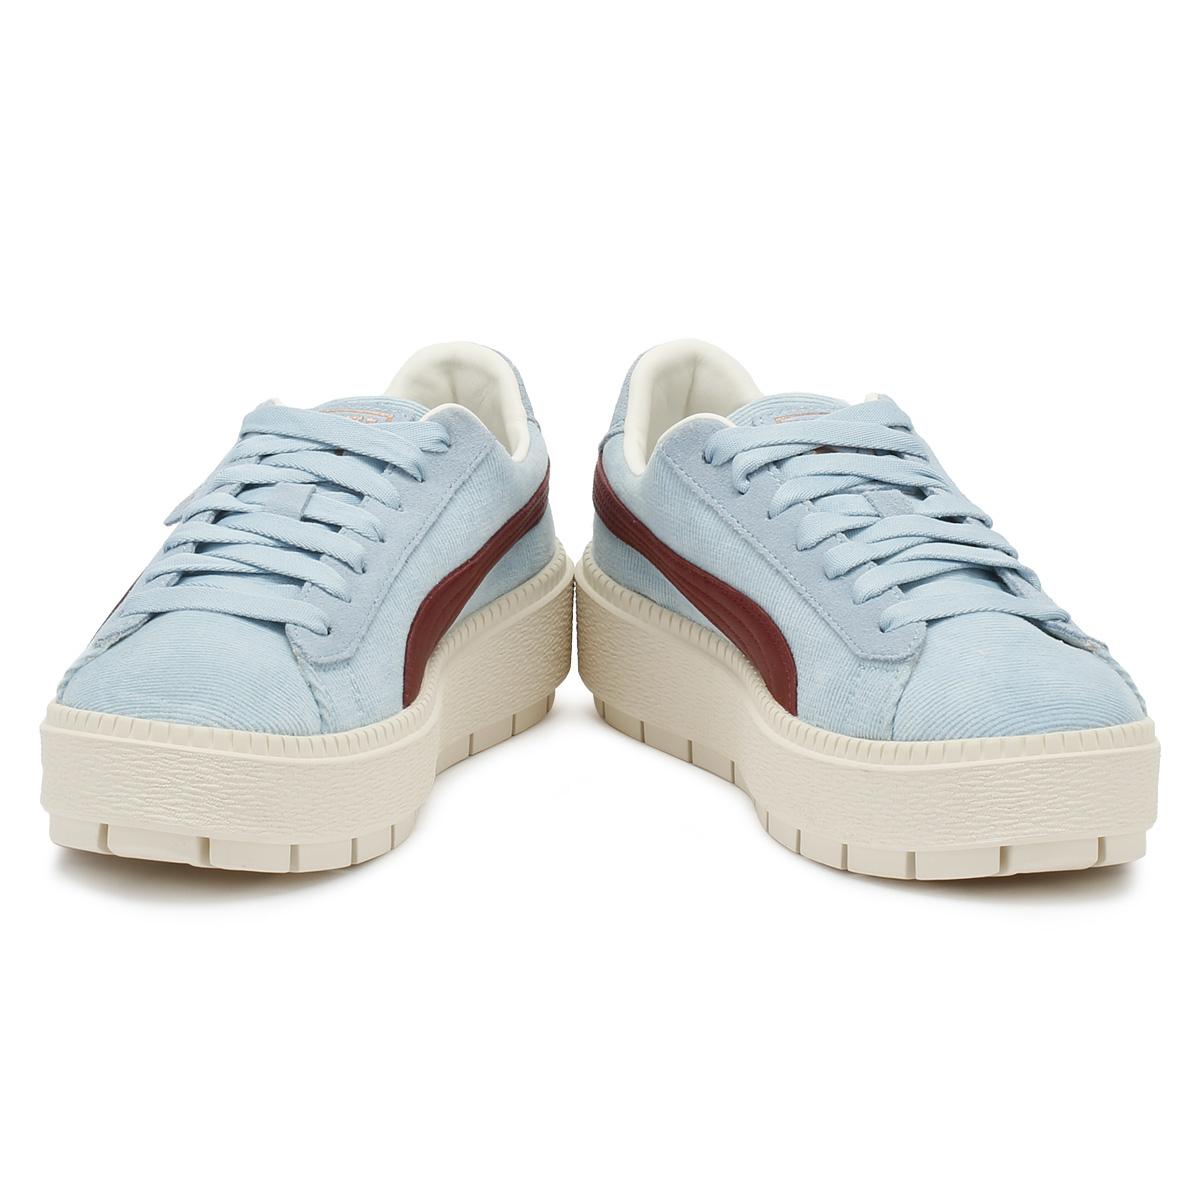 201314a7a6d3 PUMA Womens Trainers Cerulean Blue Corduroy Trace Platform Lace Up Casual  Shoes